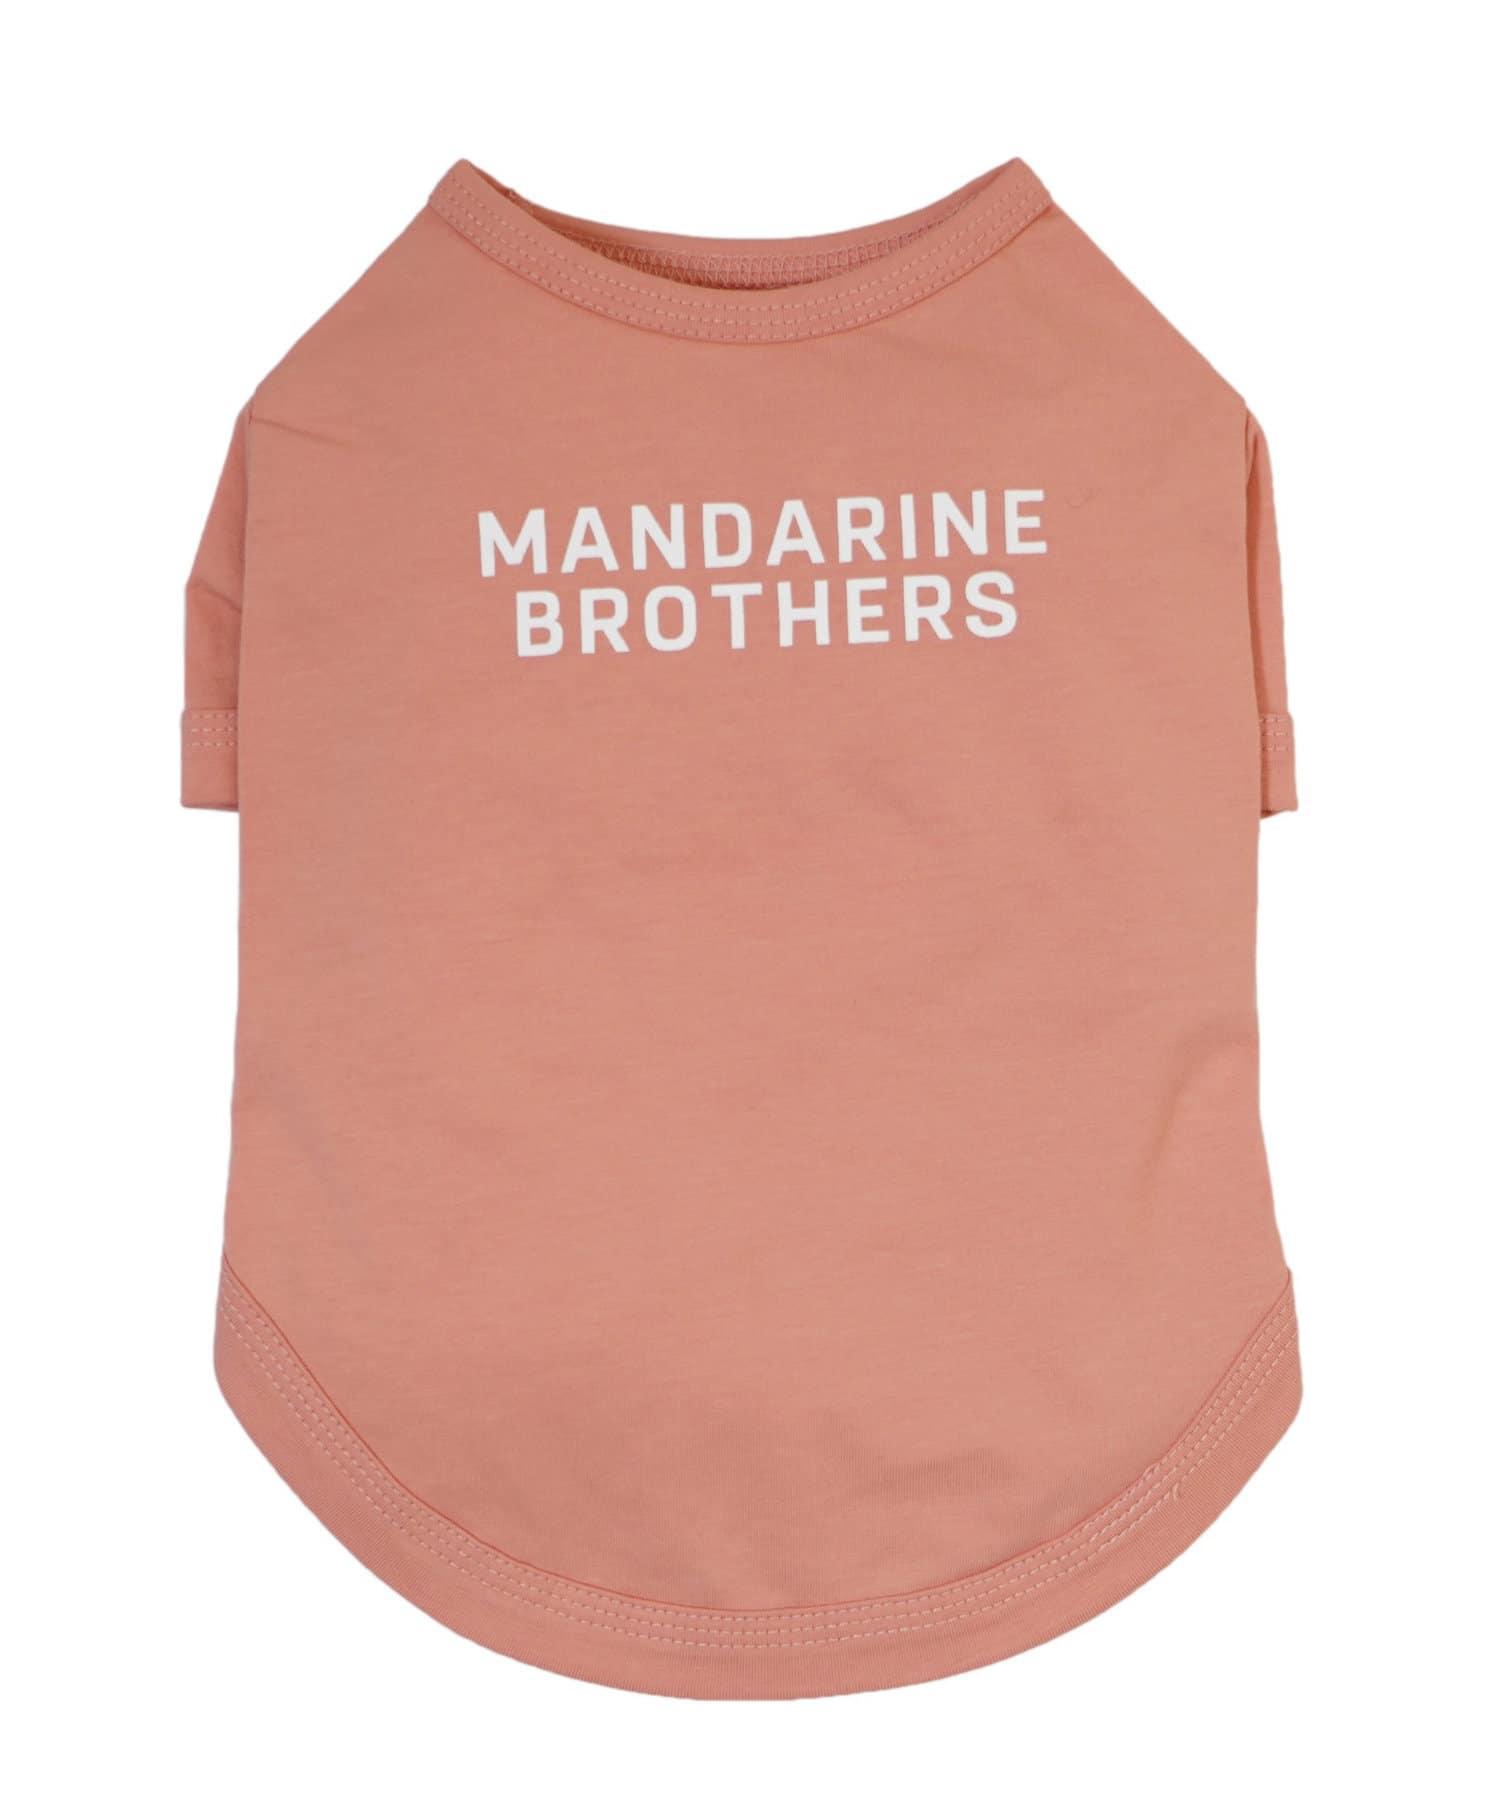 prose verse(プロズヴェール) 【MANDARINE BROTHERS】(XL/XXL)ベーシッククールTシャツ